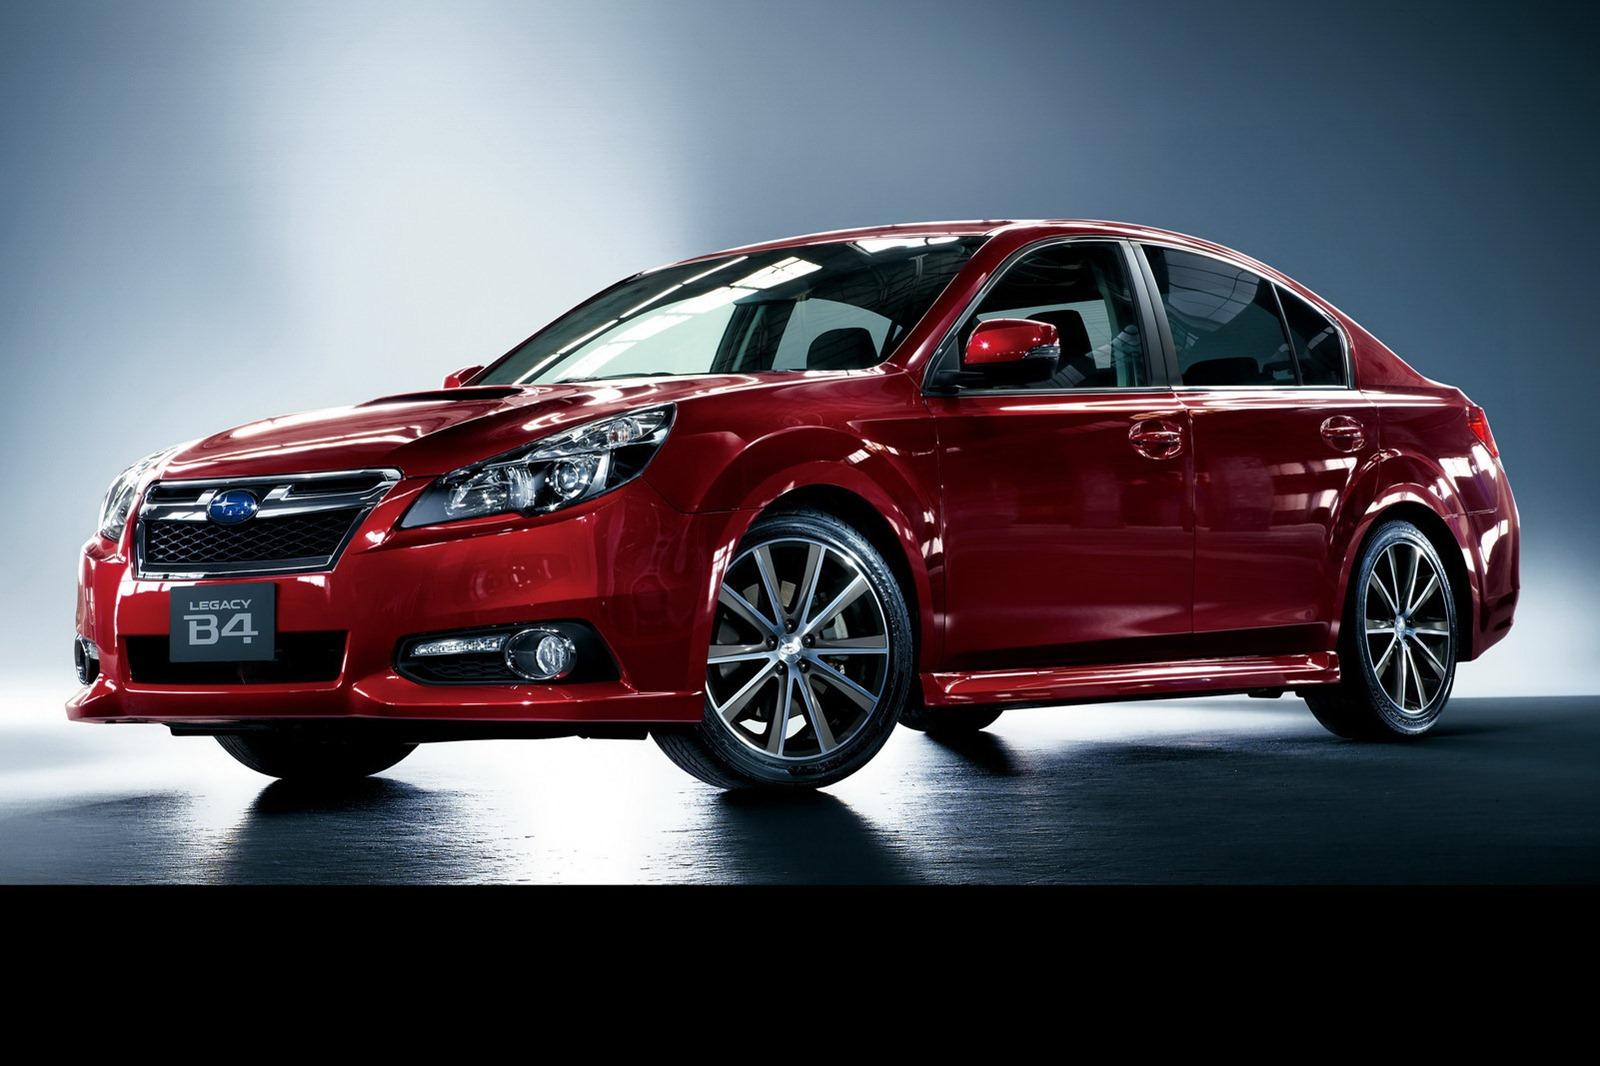 2013 Subaru Legacy GT